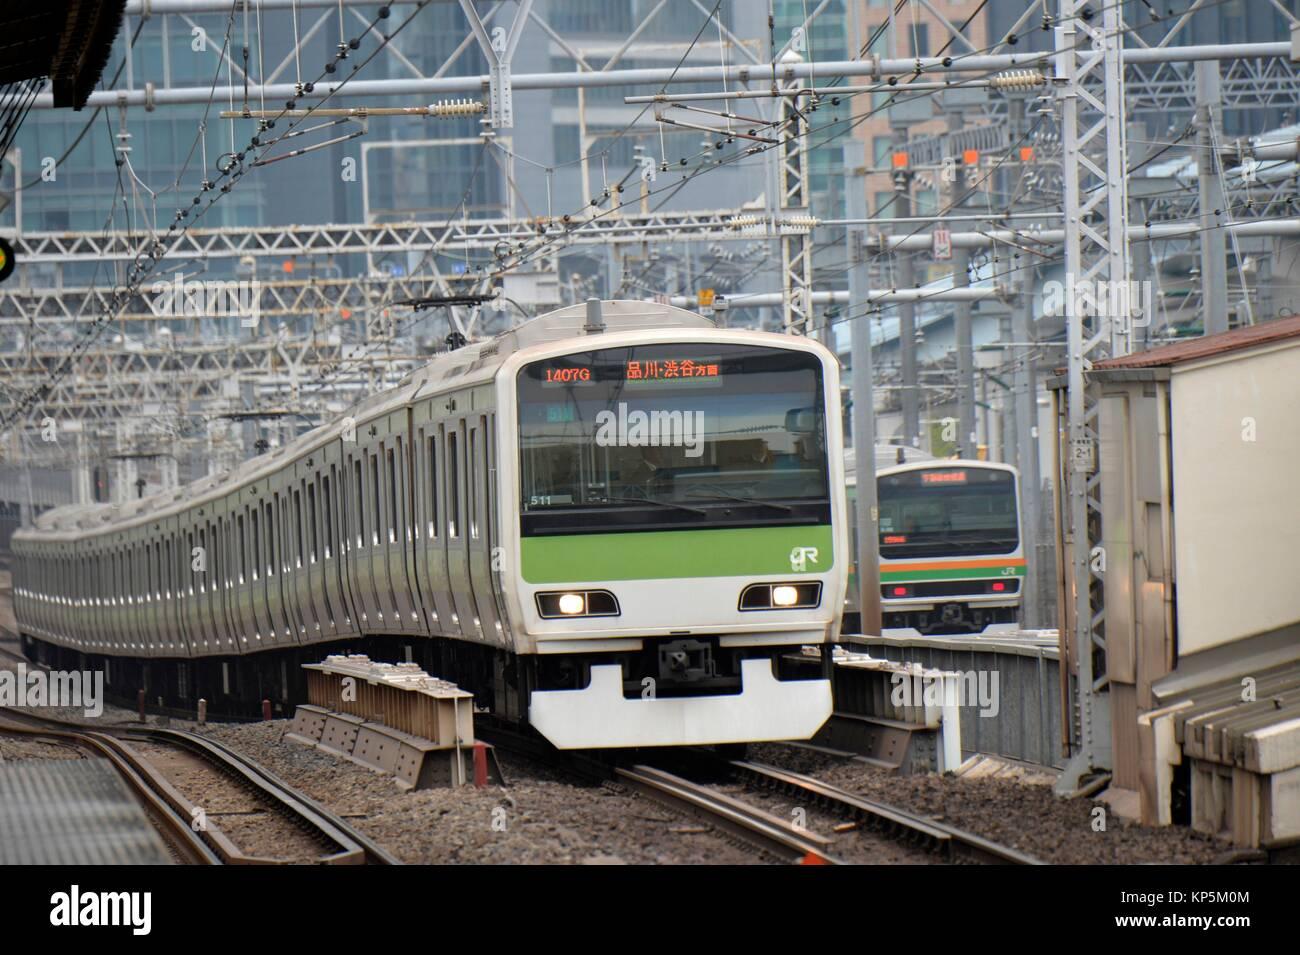 La gare JR Yamanote, Tokyo, Japon, Asie. Photo Stock